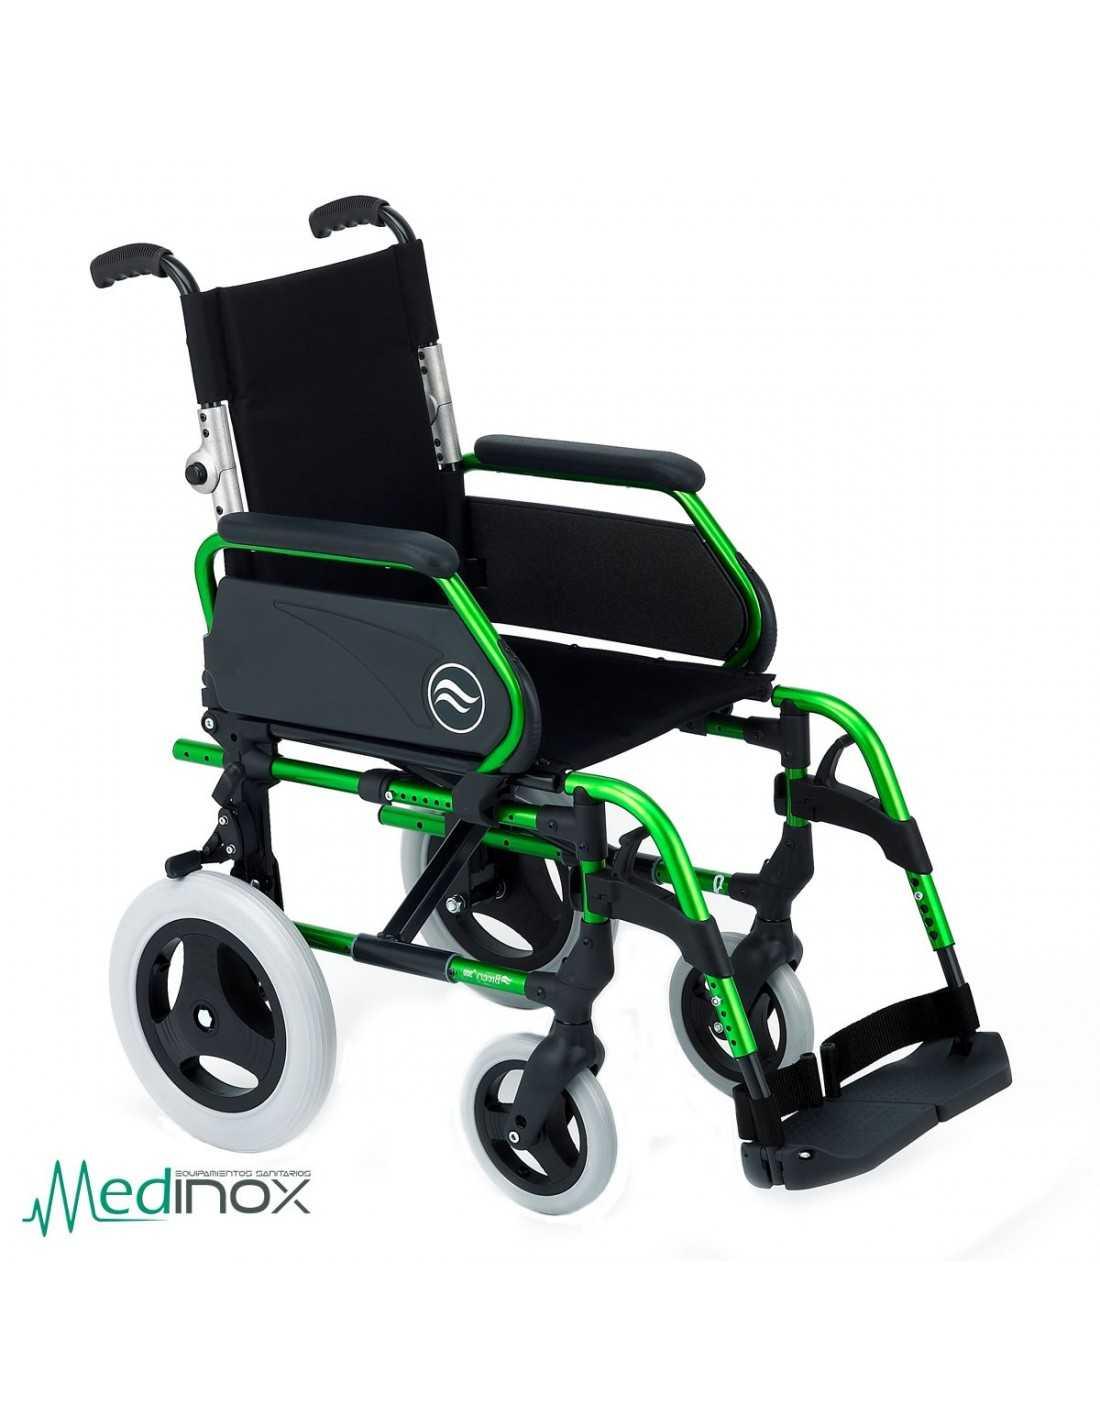 Sillas de ruedas plegables sub300 resistentes robustas y muy ligeras - Sillas de ruedas plegables y ligeras ...